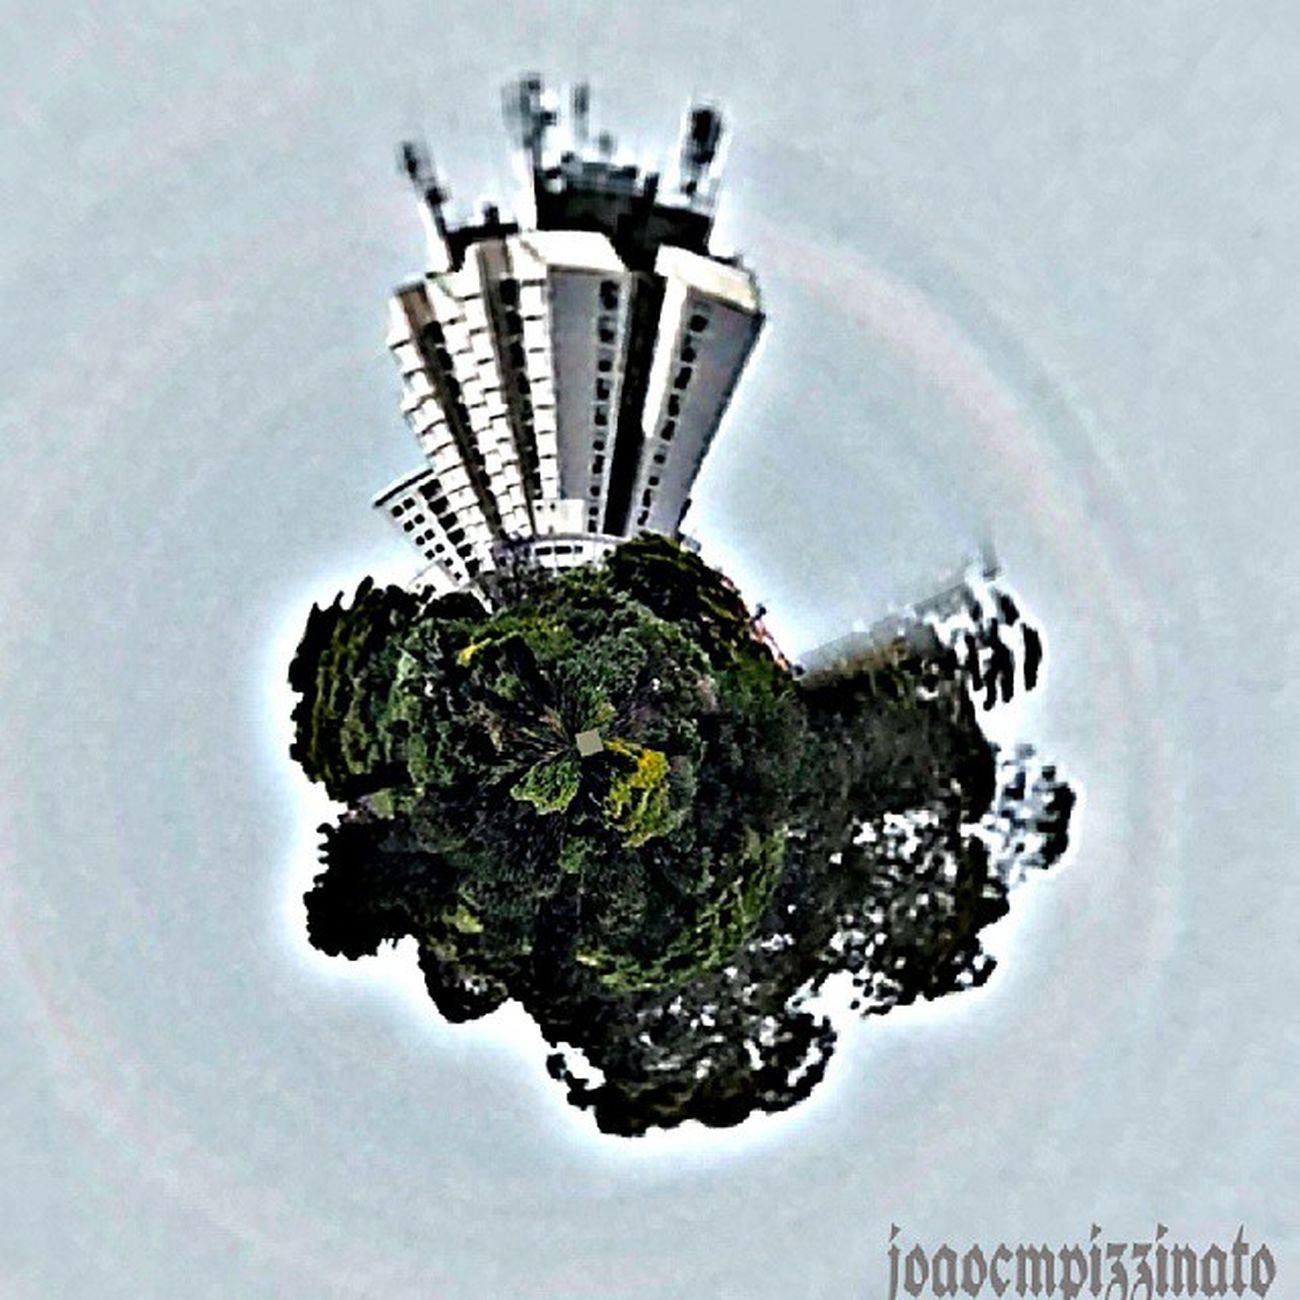 Tiny Planet FX. Tinyplanetfx Colors City Zonasul saopaulo brasil photography edited effect